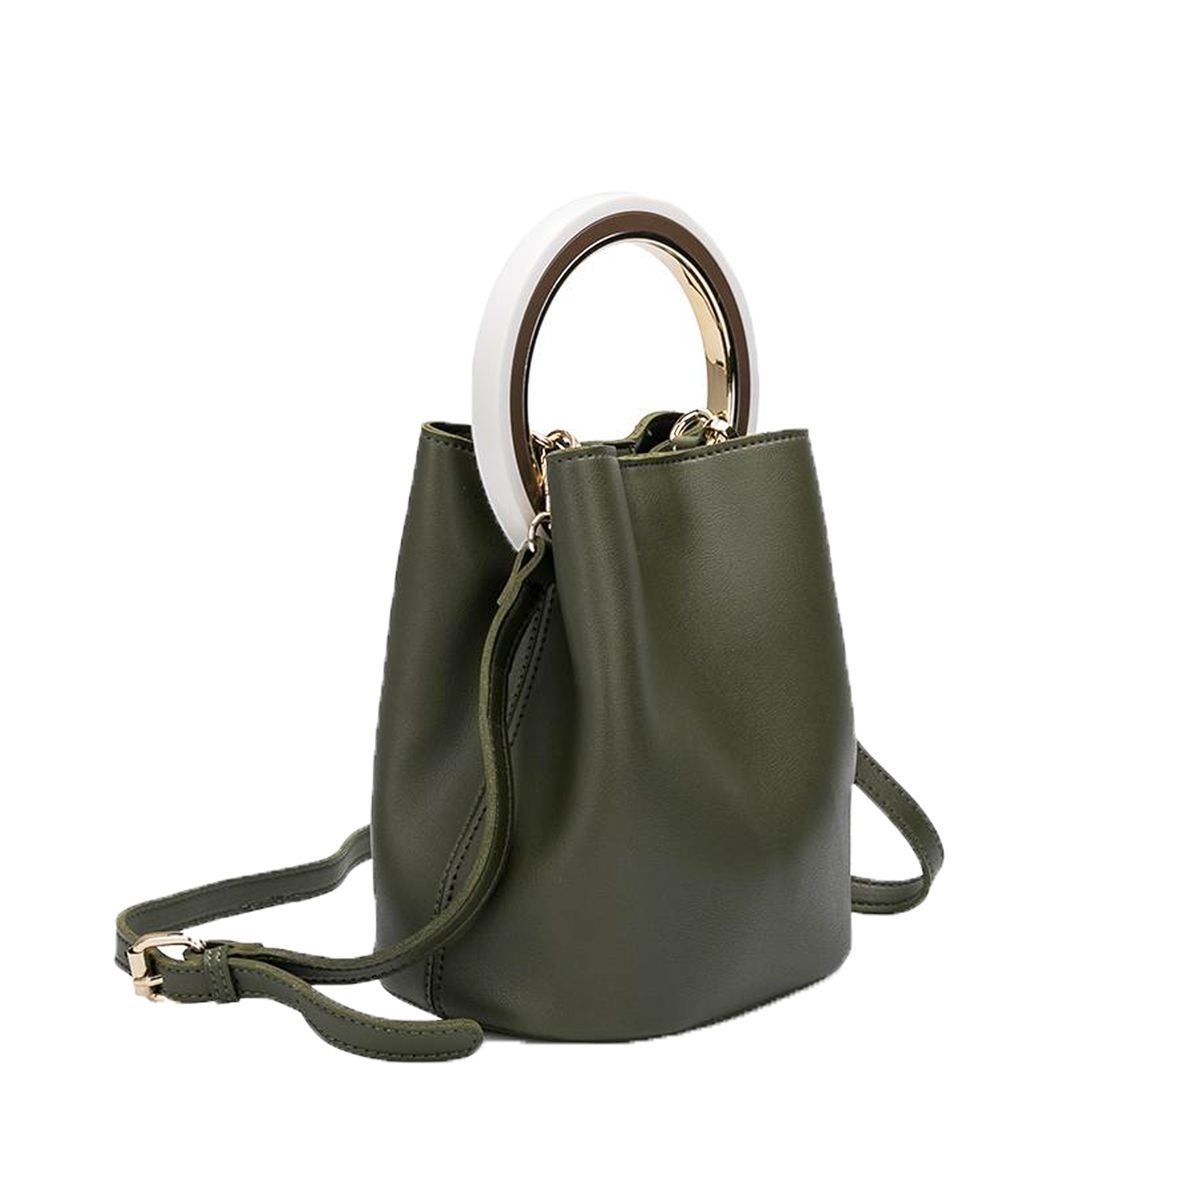 ad17444030a Melie Bianco Gemma Vegan Leather Ring Bucket Crossbody Bag, Olive